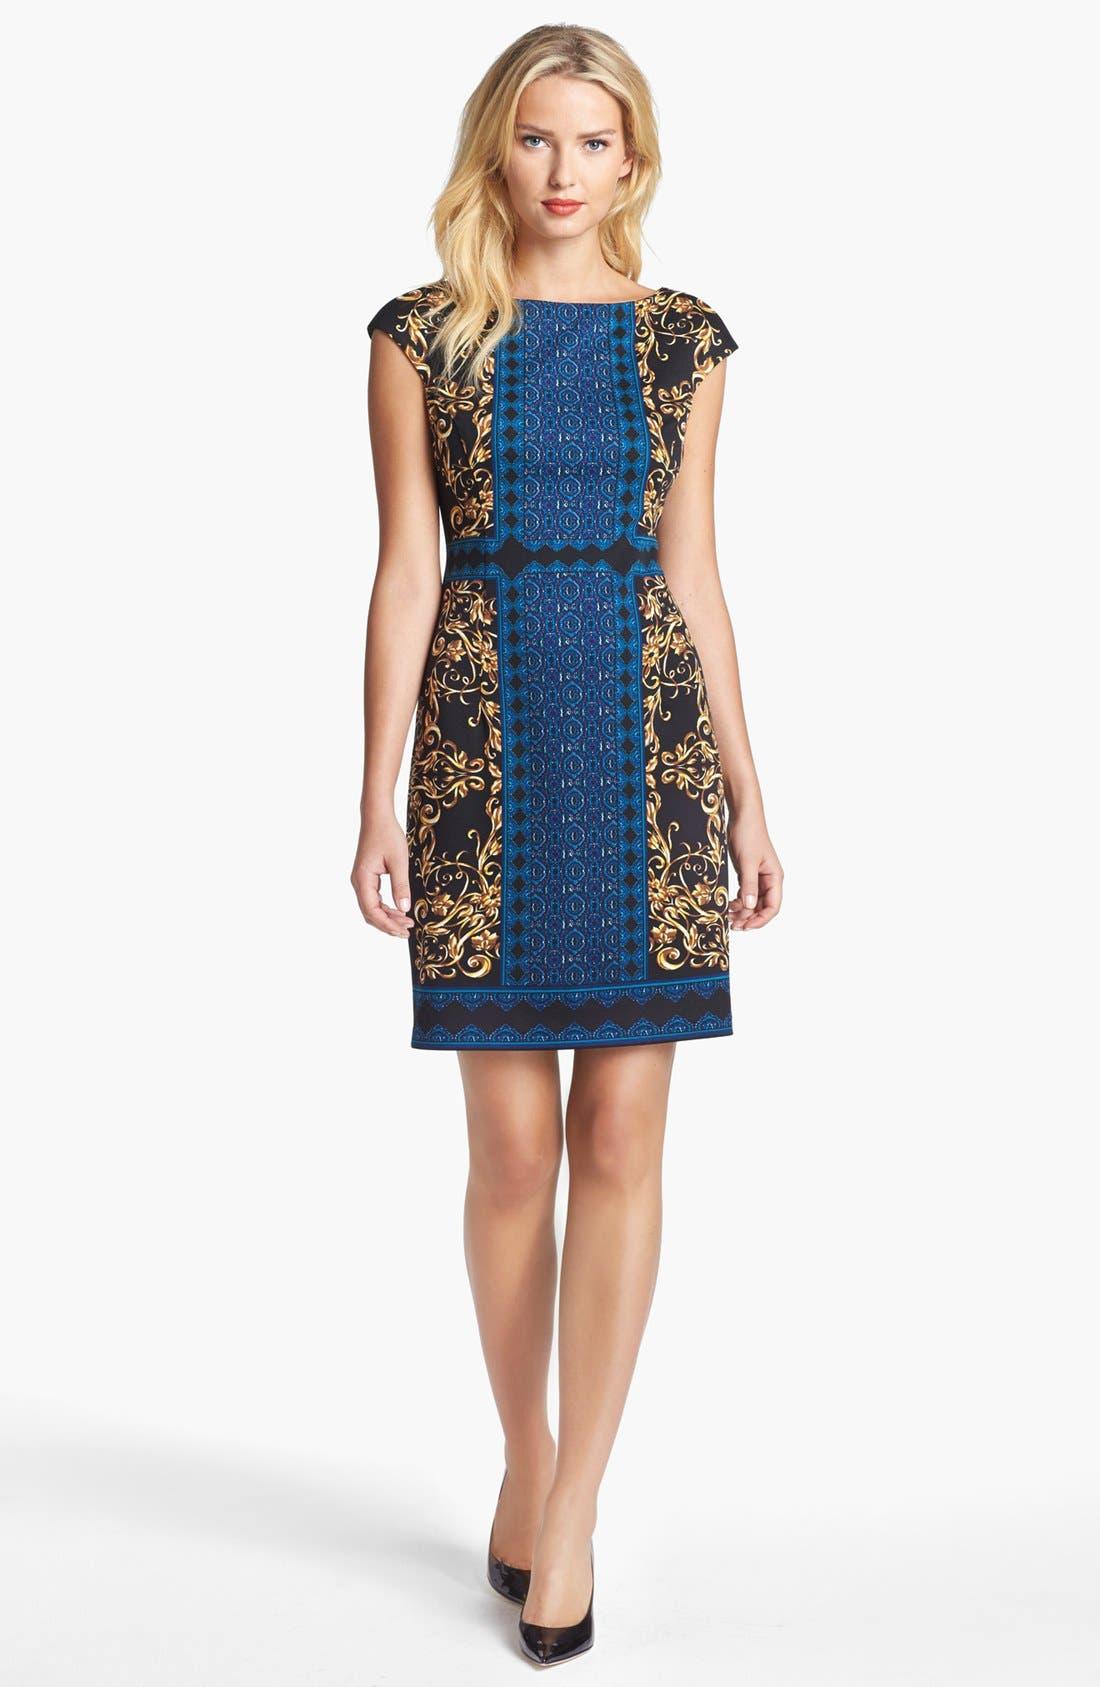 Alternate Image 1 Selected - Maggy London Mix Print Ponte Knit Sheath Dress